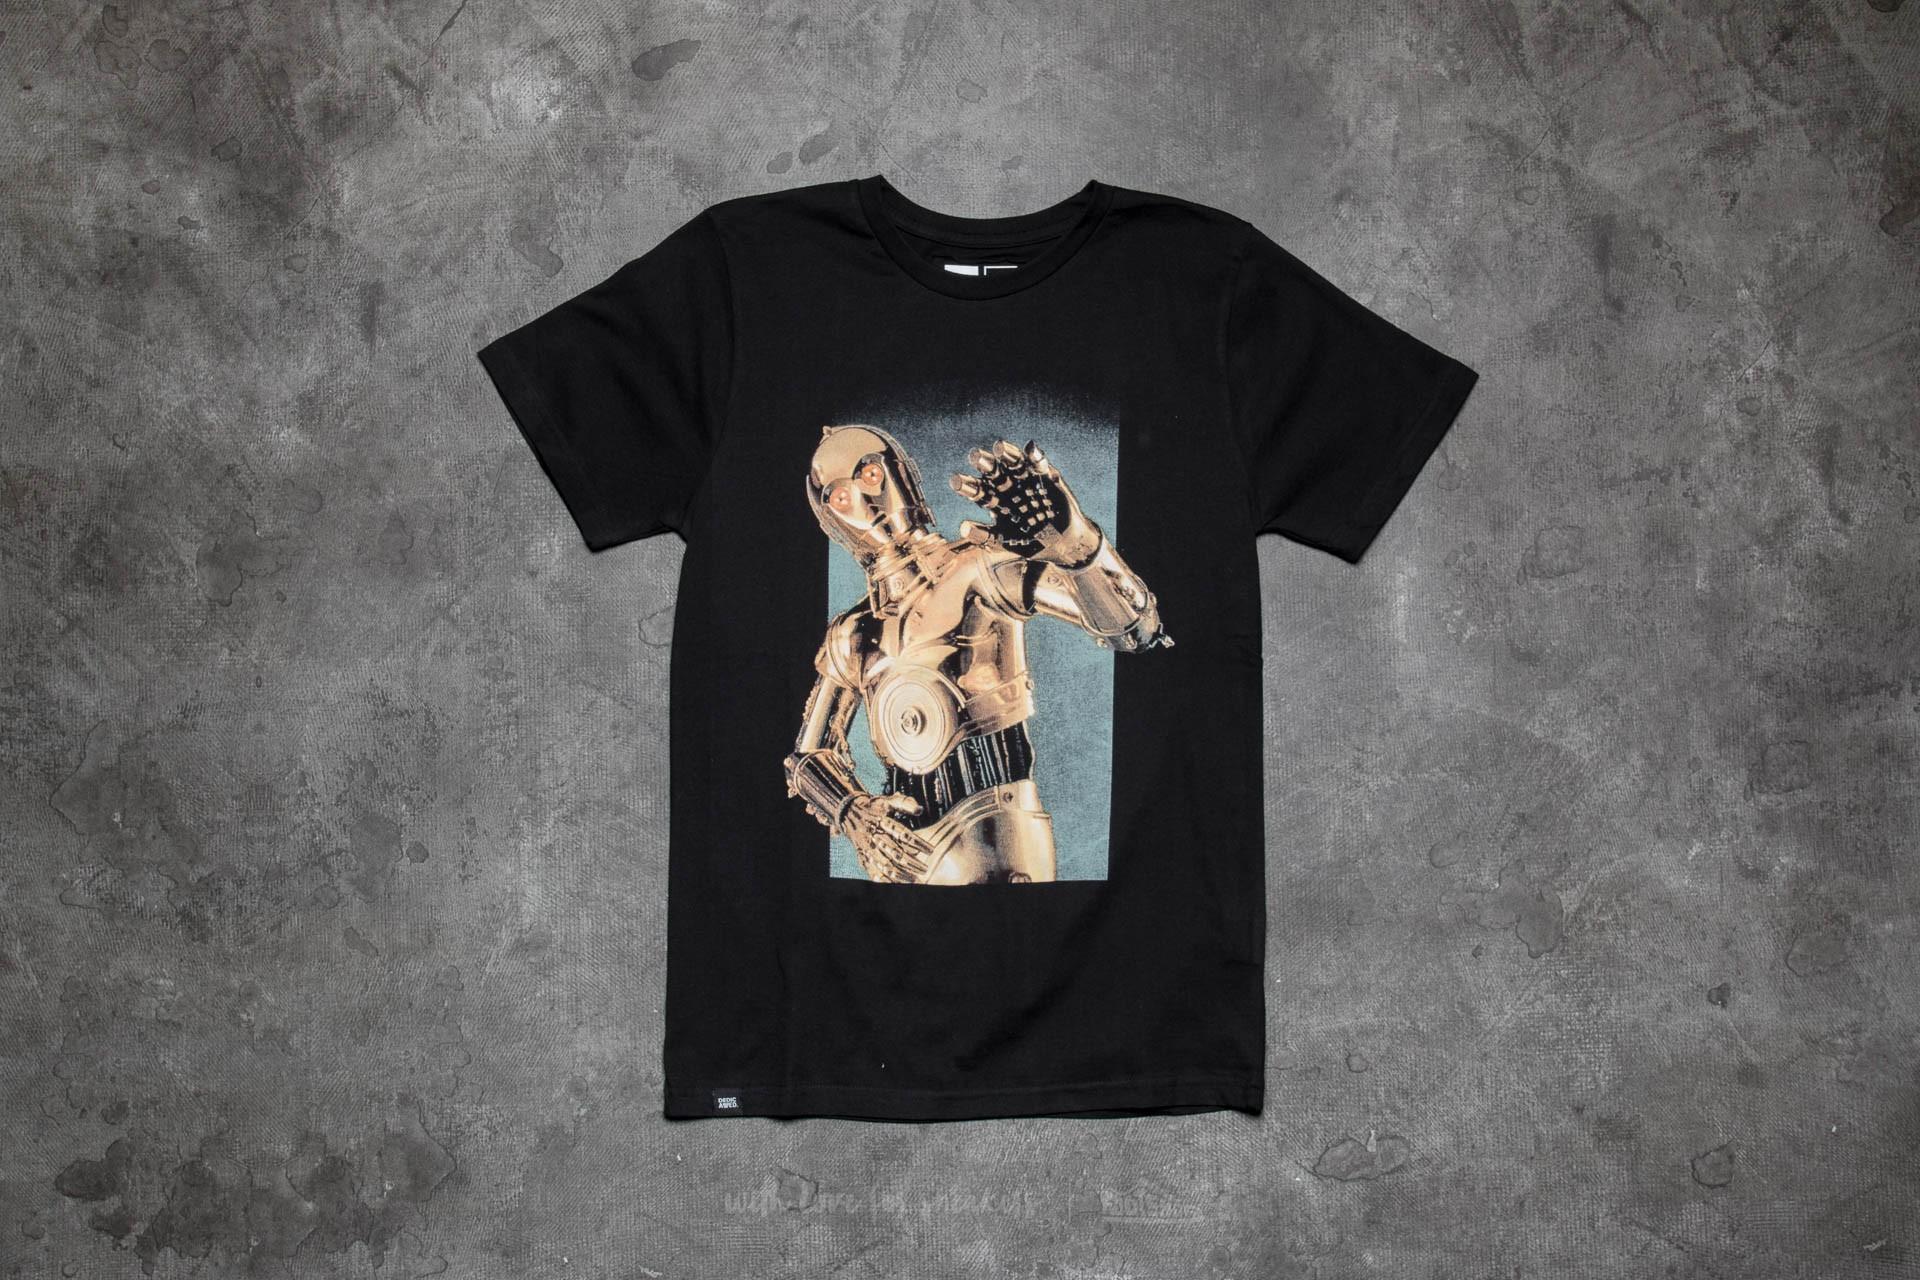 Dedicated x Star Wars C-3PO Hello T-Shirt Black - 10942